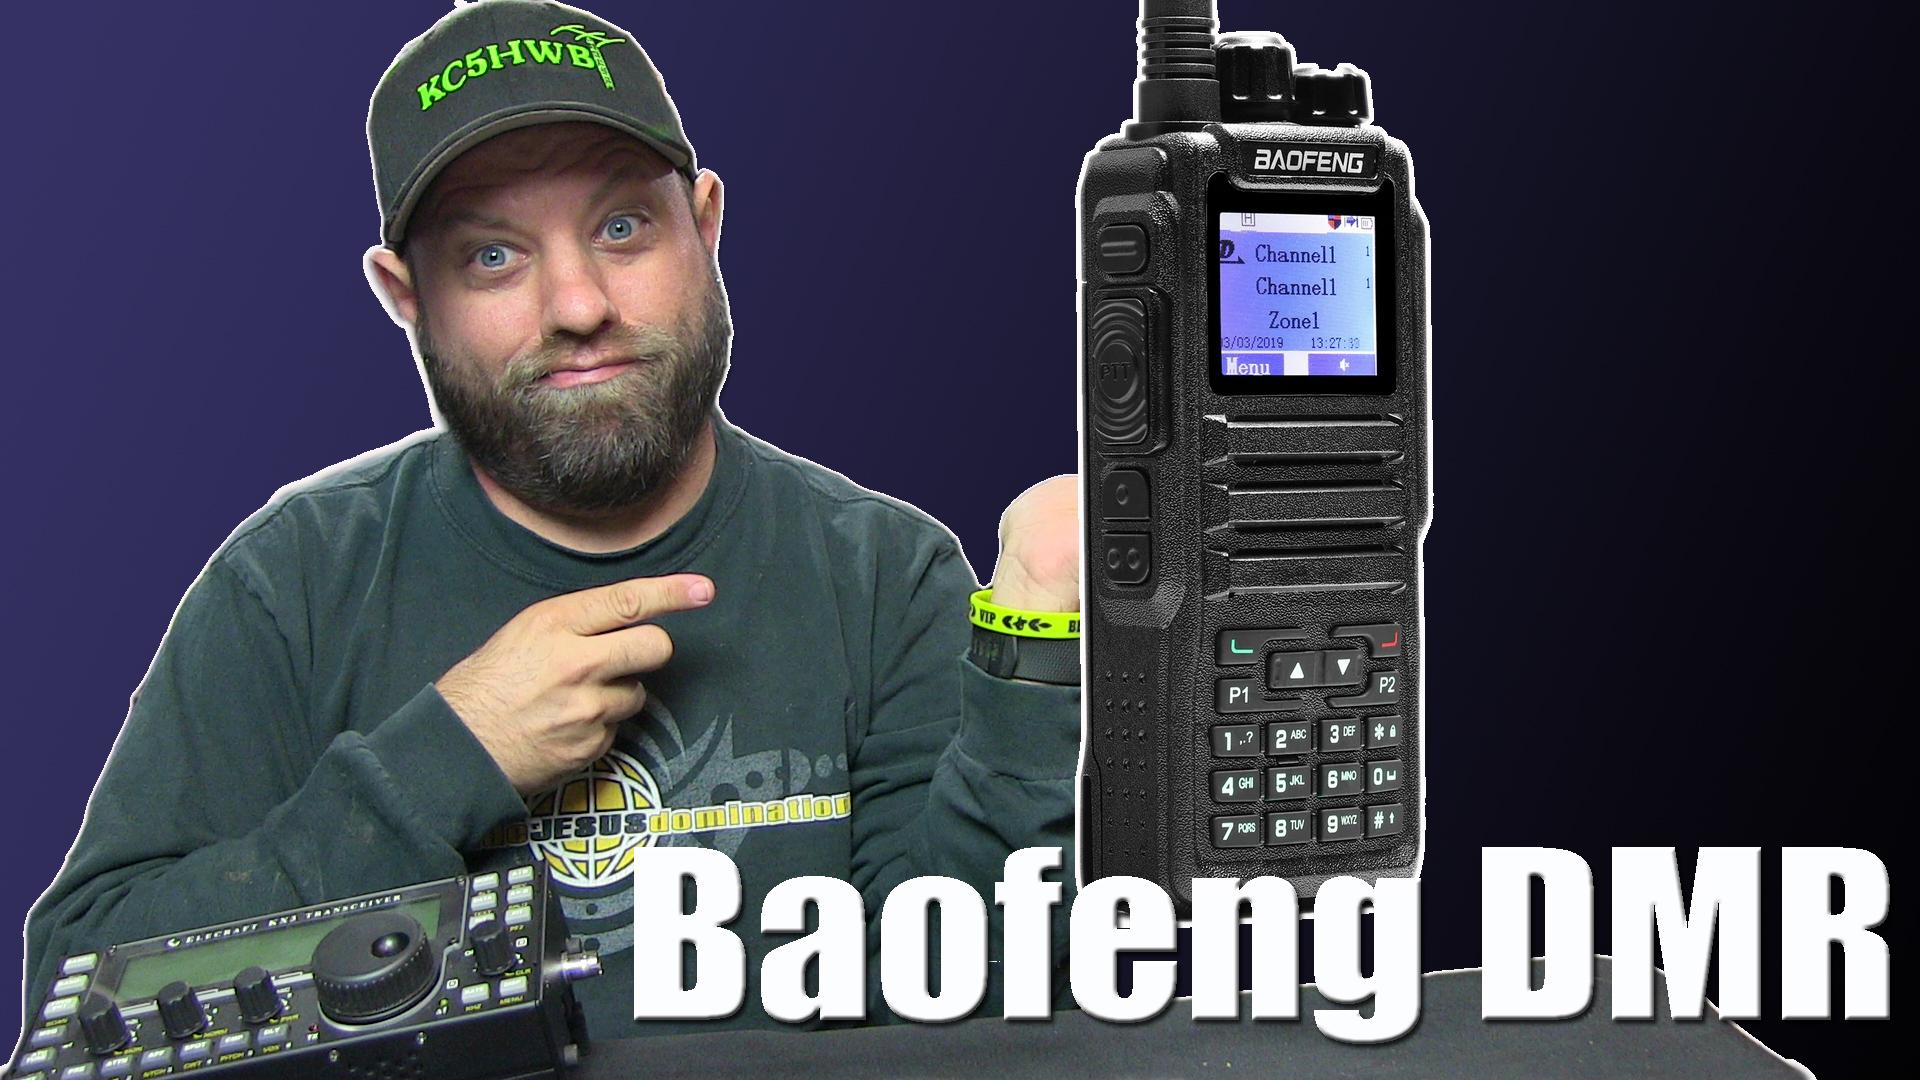 Episode 321: Baofeng DM-1701 Dual Band DMR HT